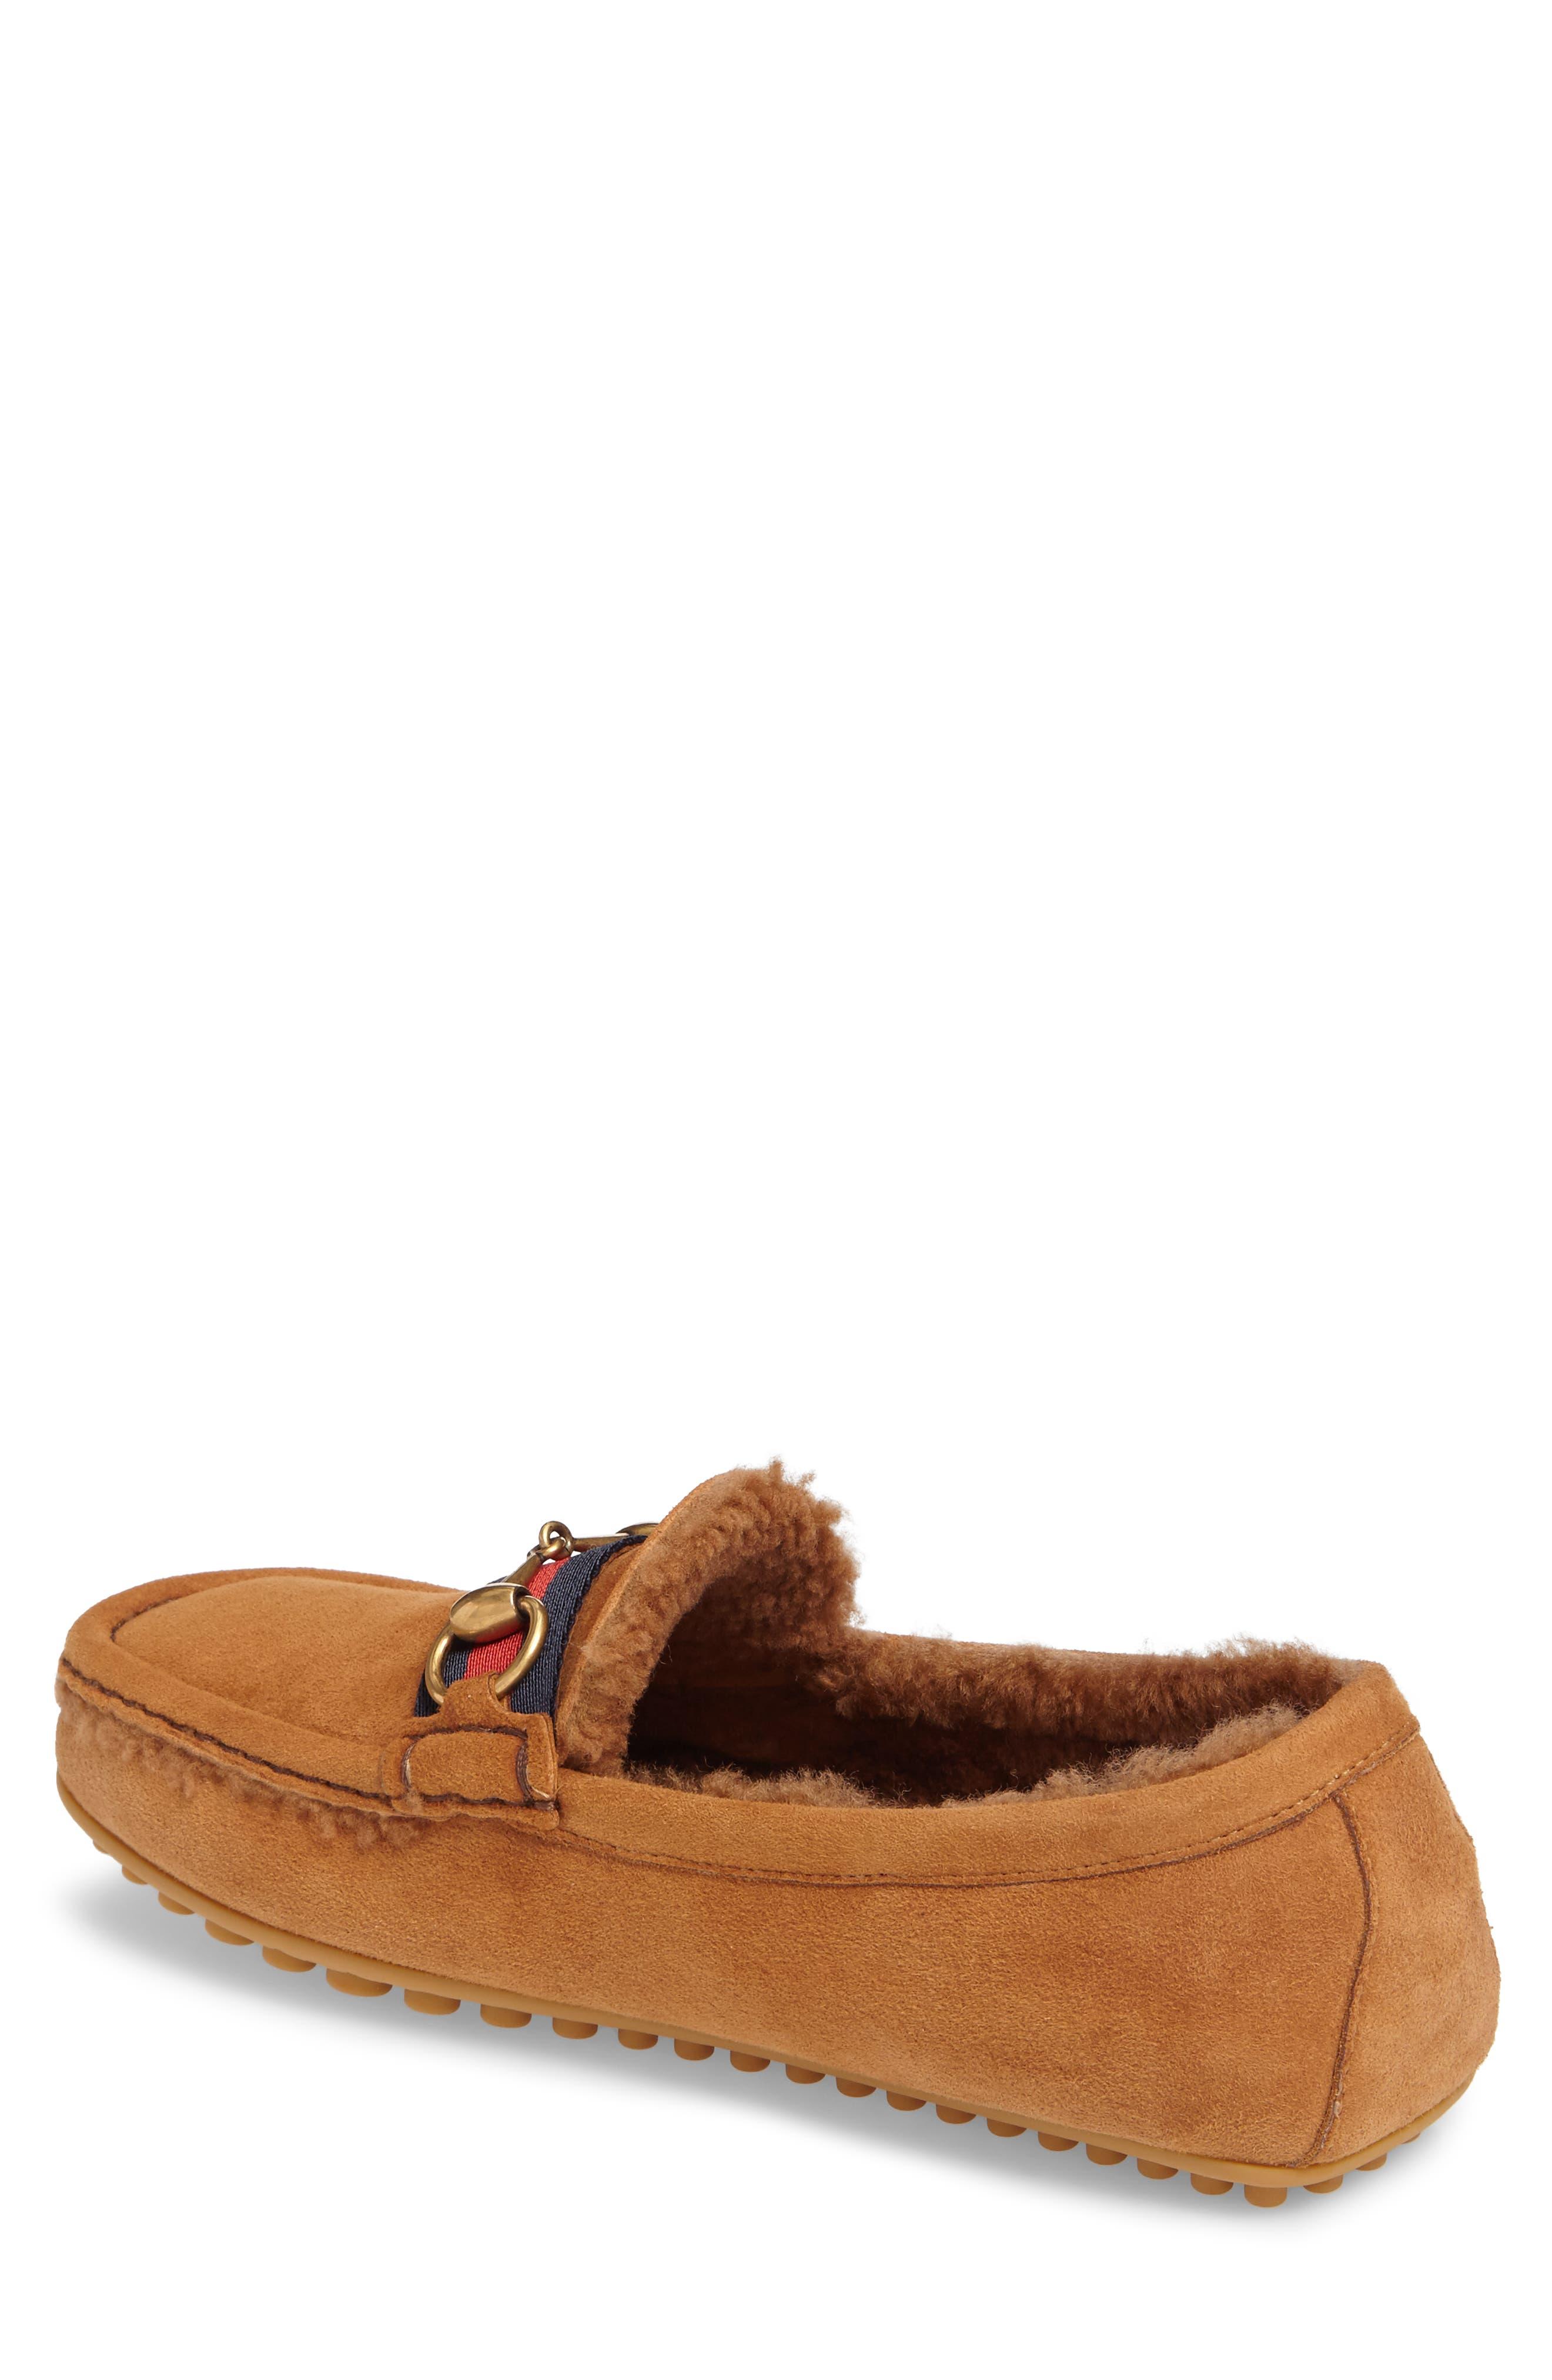 Driving Shoe with Genuine Shearling,                             Alternate thumbnail 2, color,                             Dark Tan